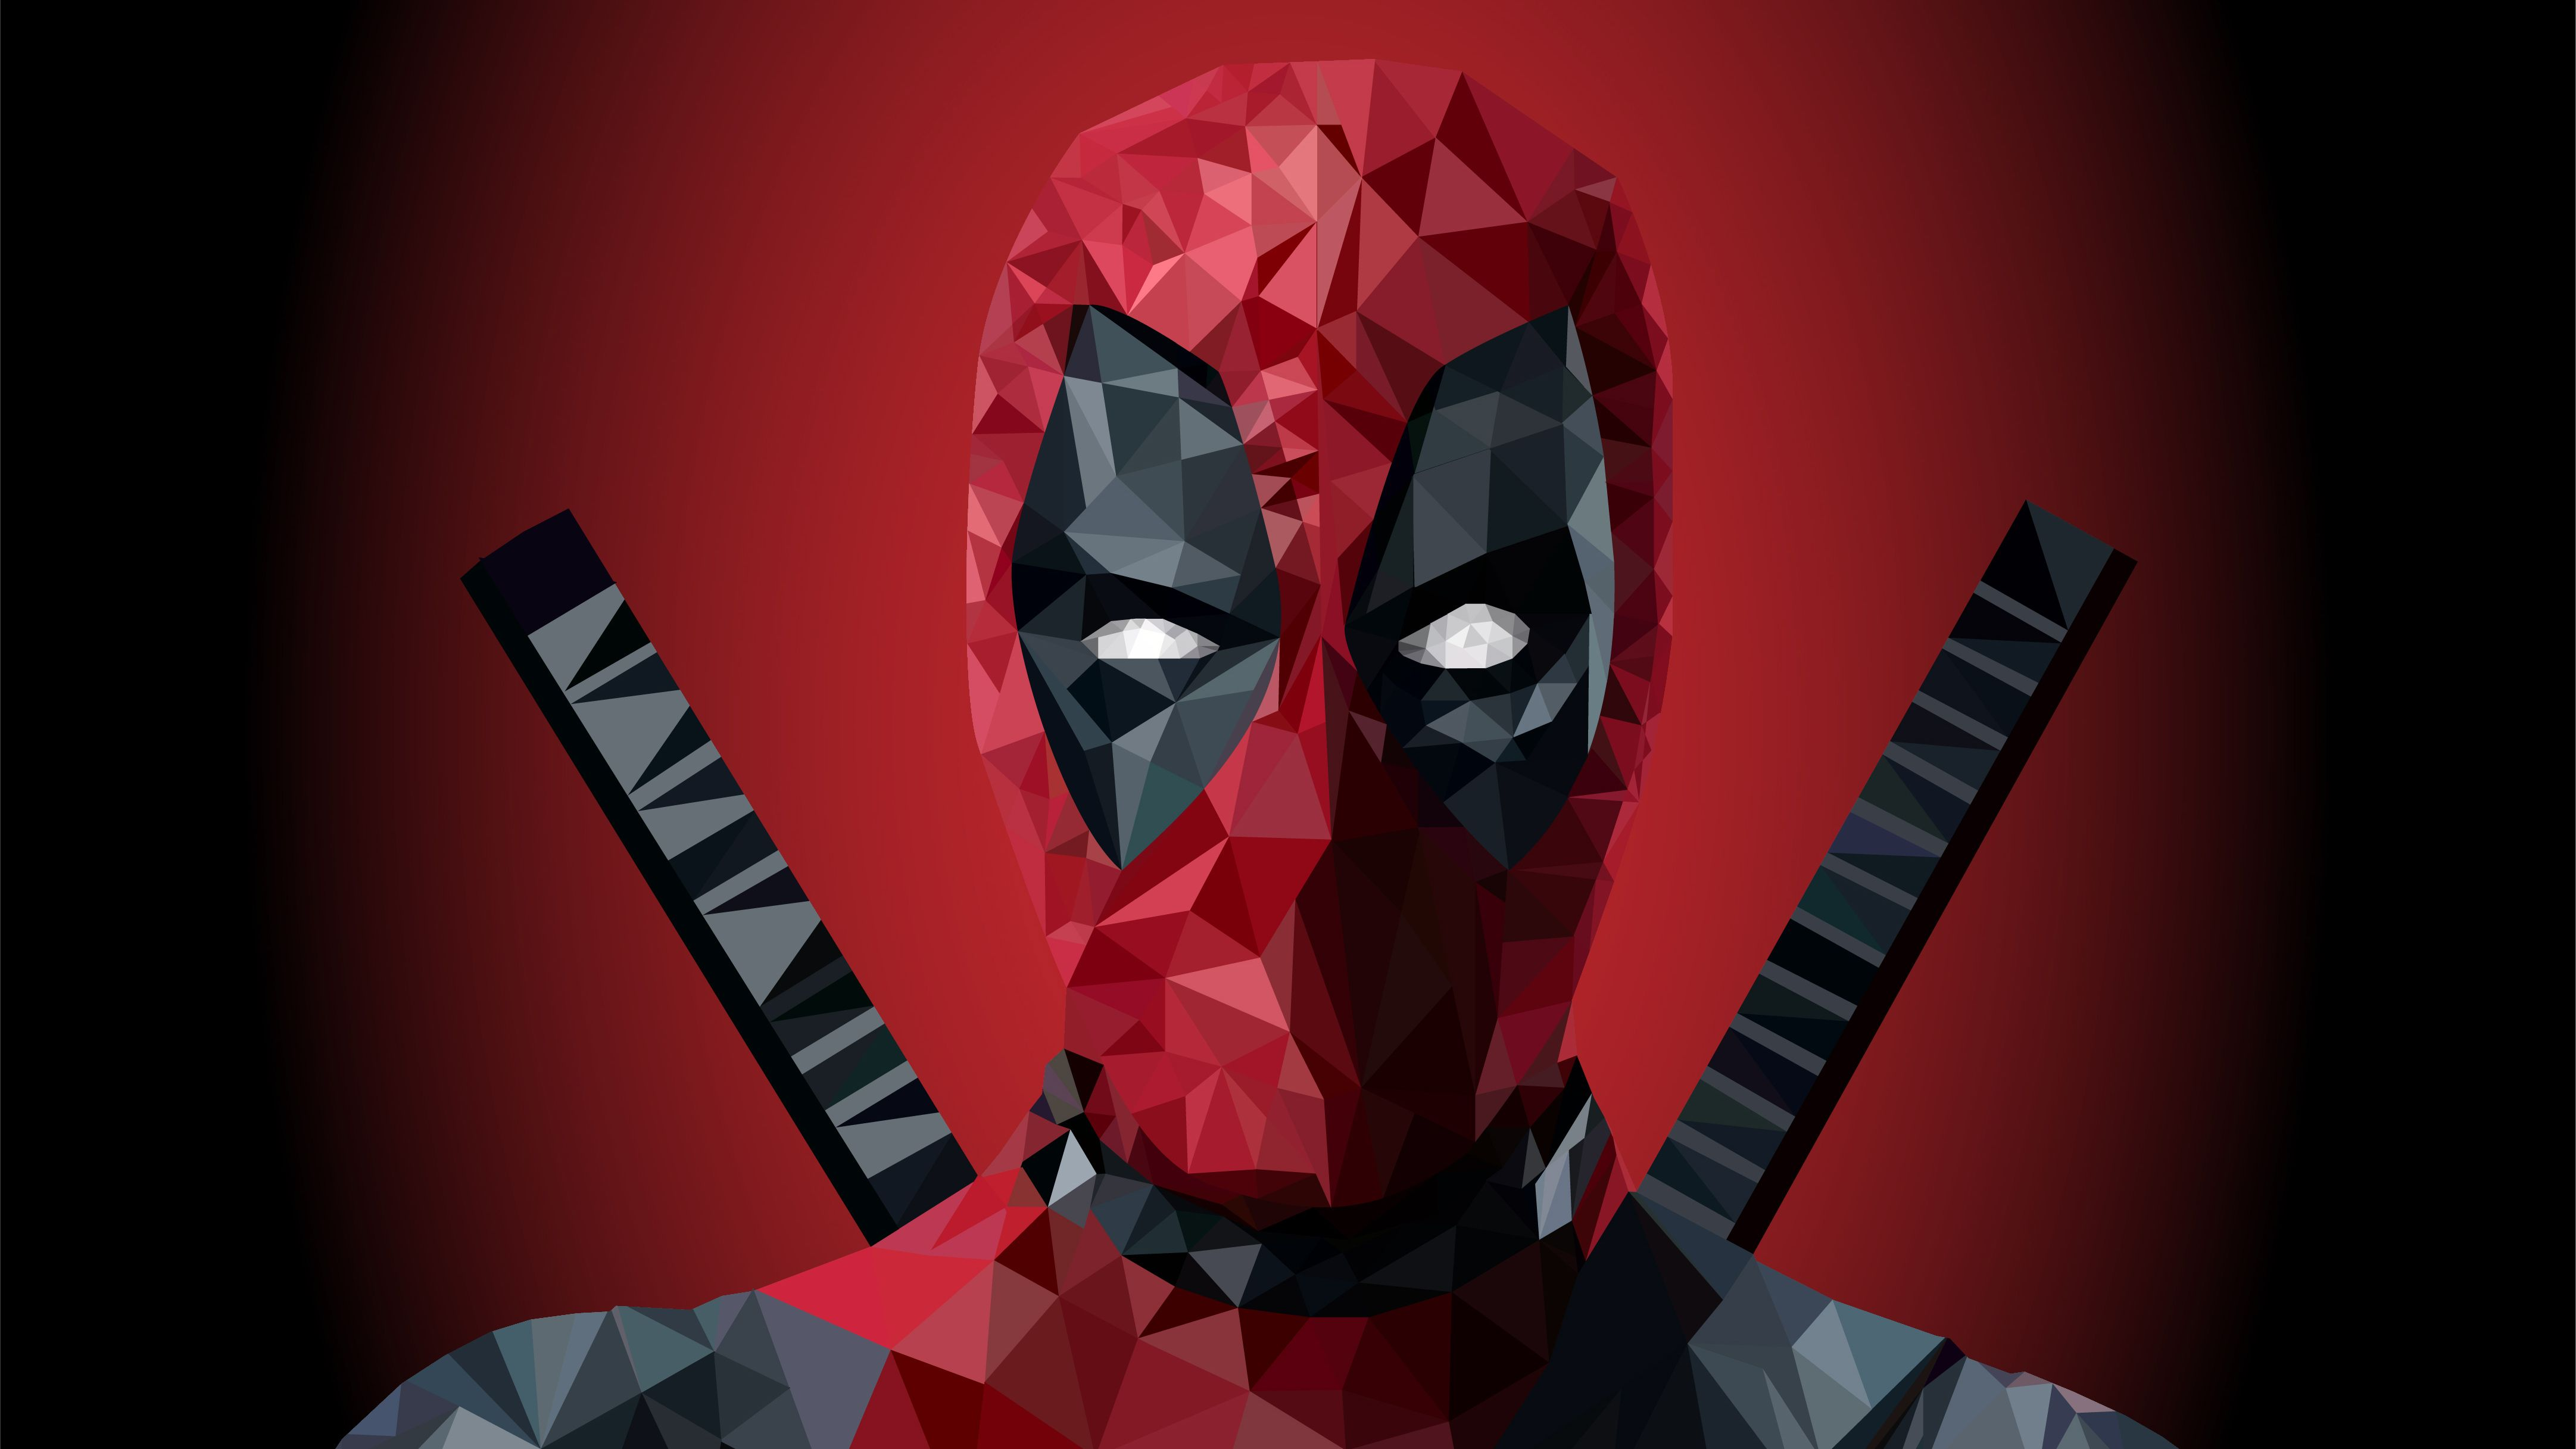 Deadpool 4k Desktop Wallpapers On Wallpaperdog